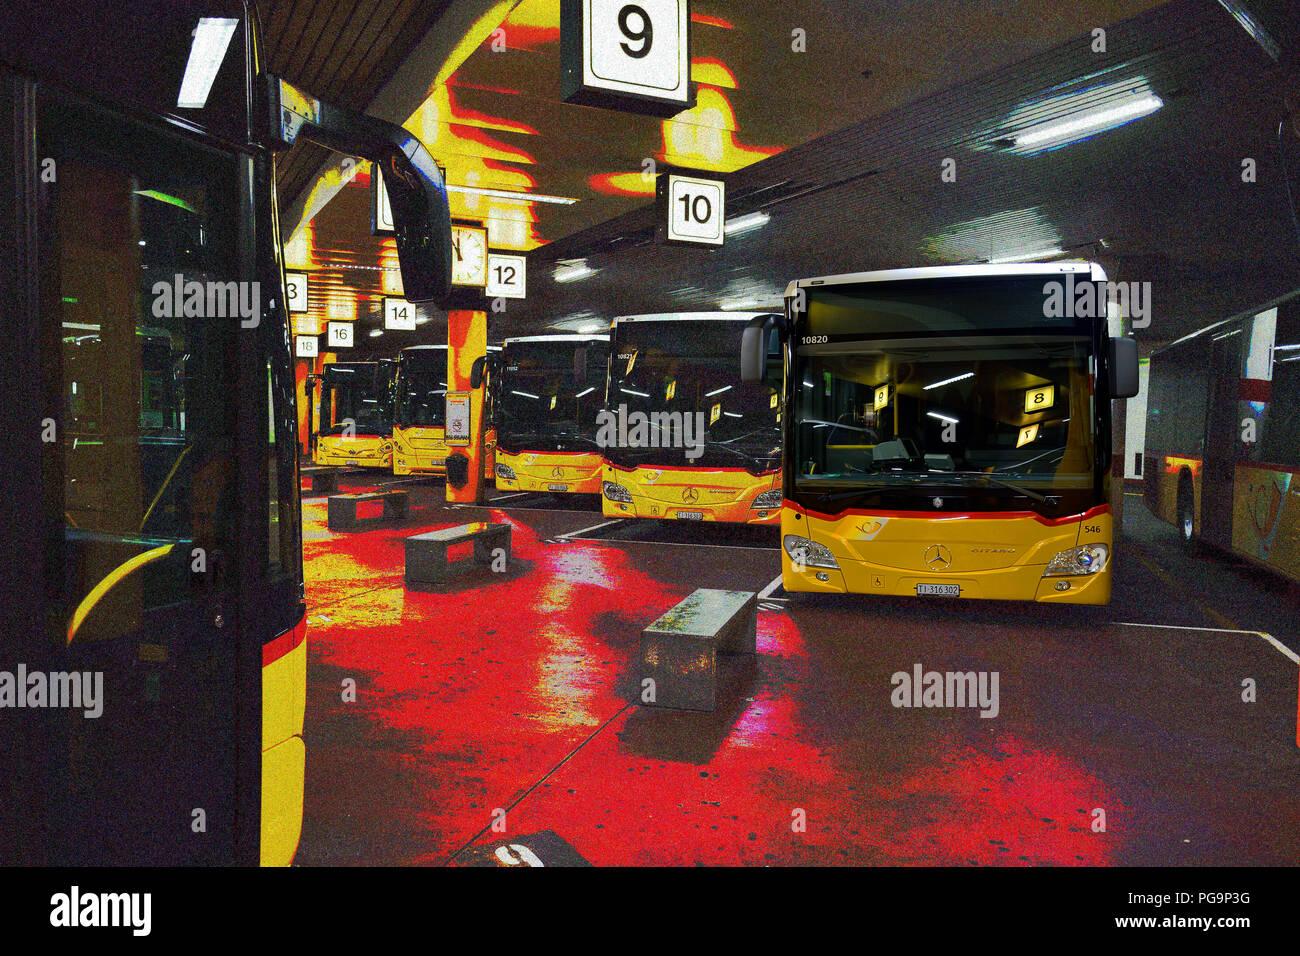 Yellow buses at the central depot in Lugano - Gelbe Busse im Zentrallager in Lugano - Bus gialli al capolinea di Lugano Stock Photo